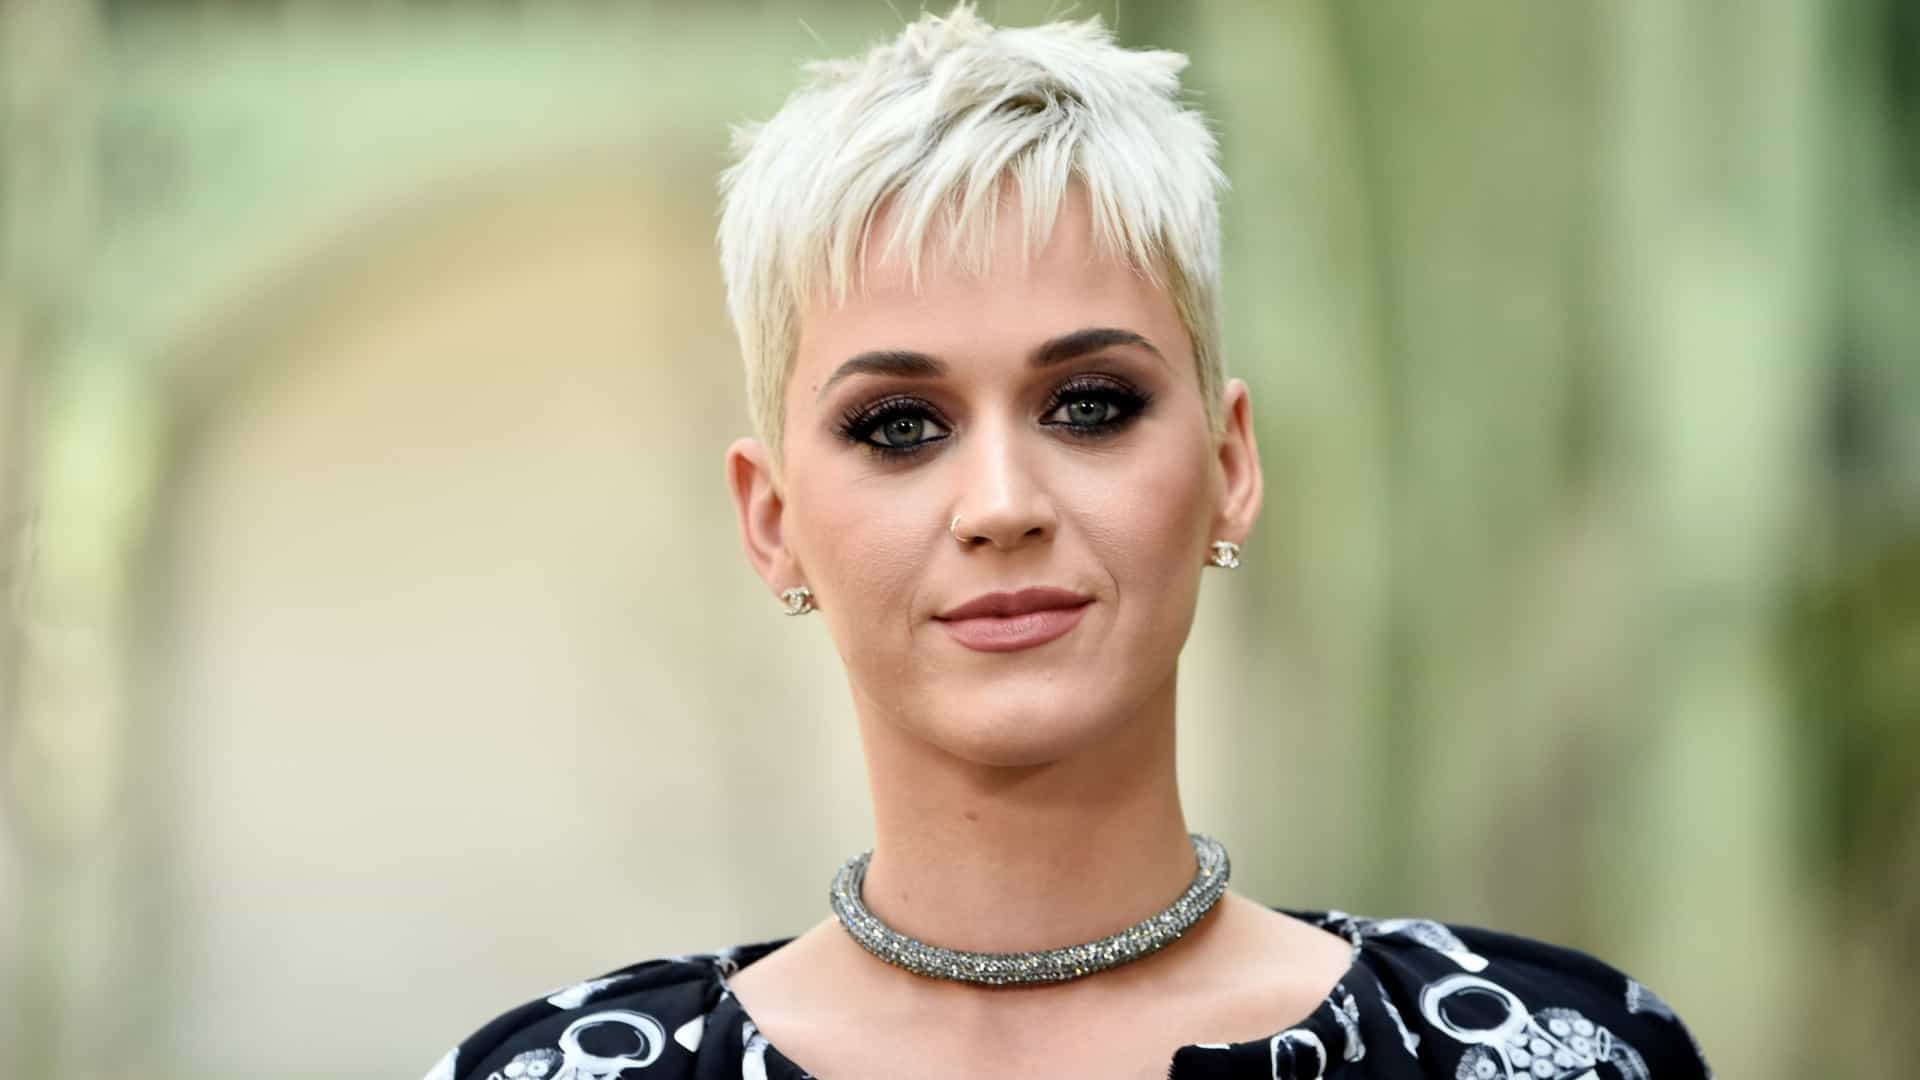 1º Katy Perry – US$ 83 milhões